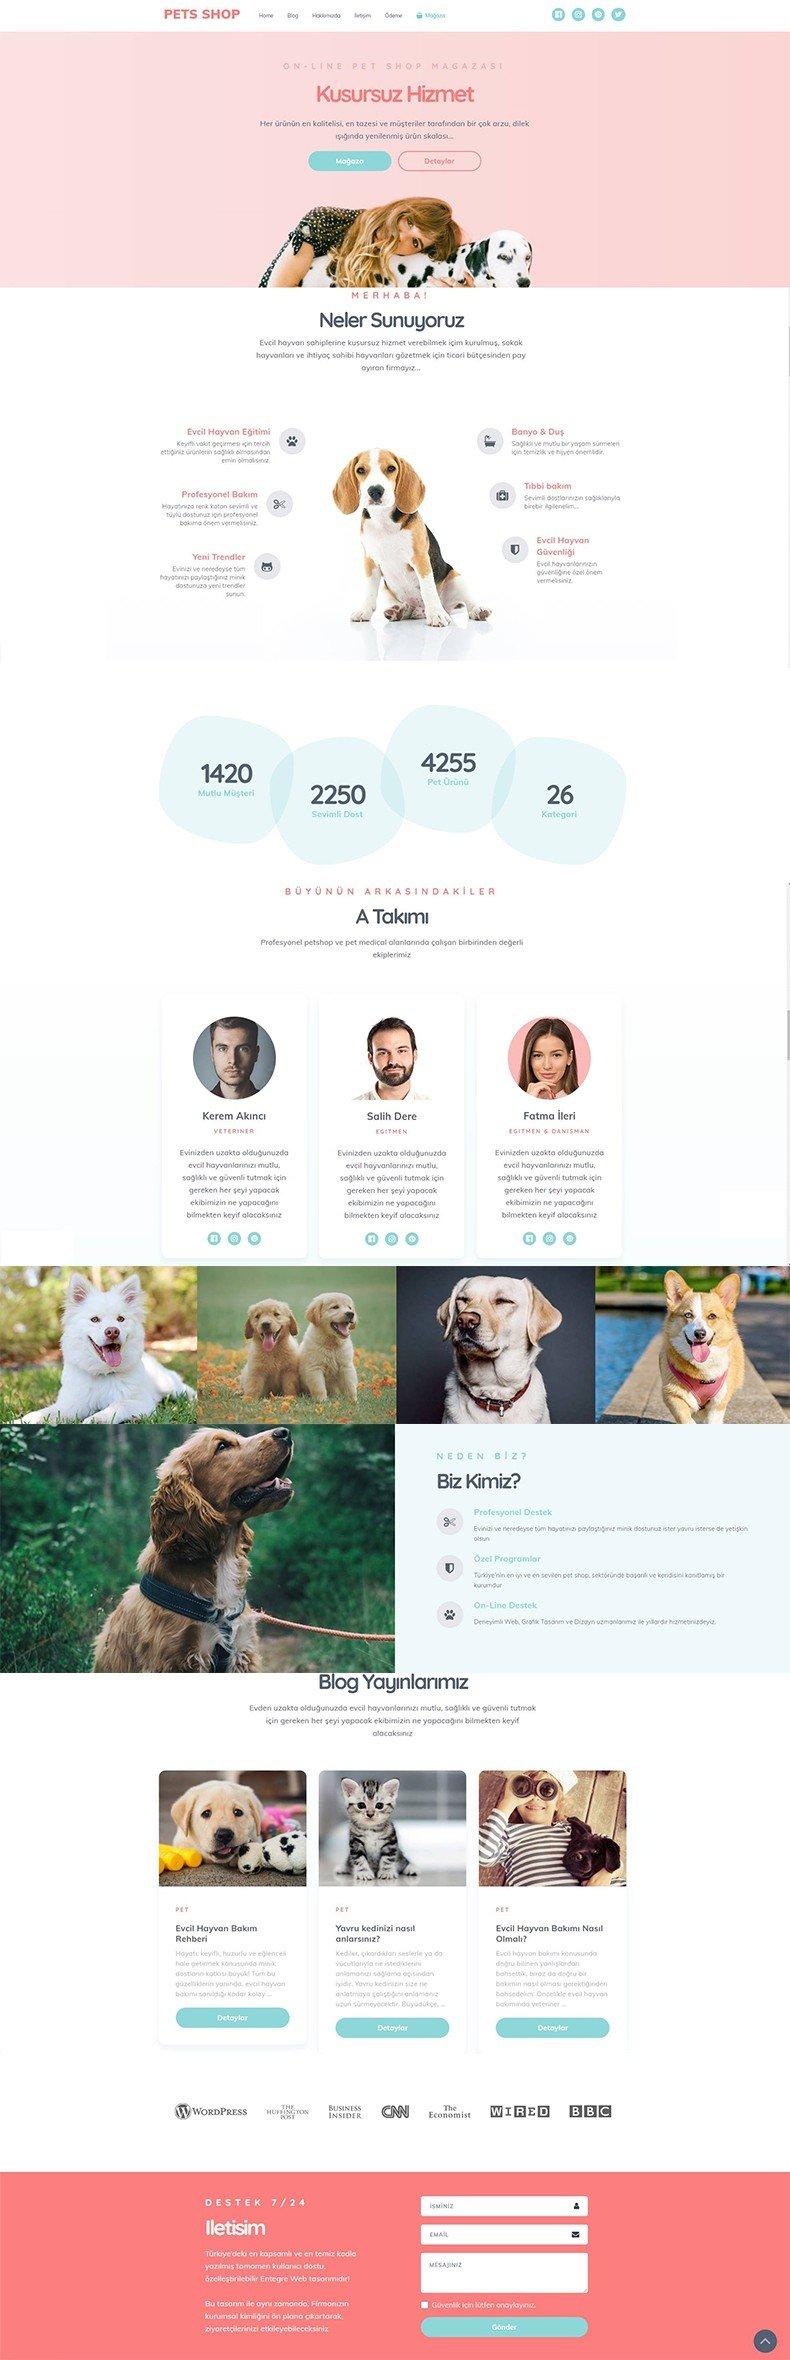 Pets Shop Web Tasarım